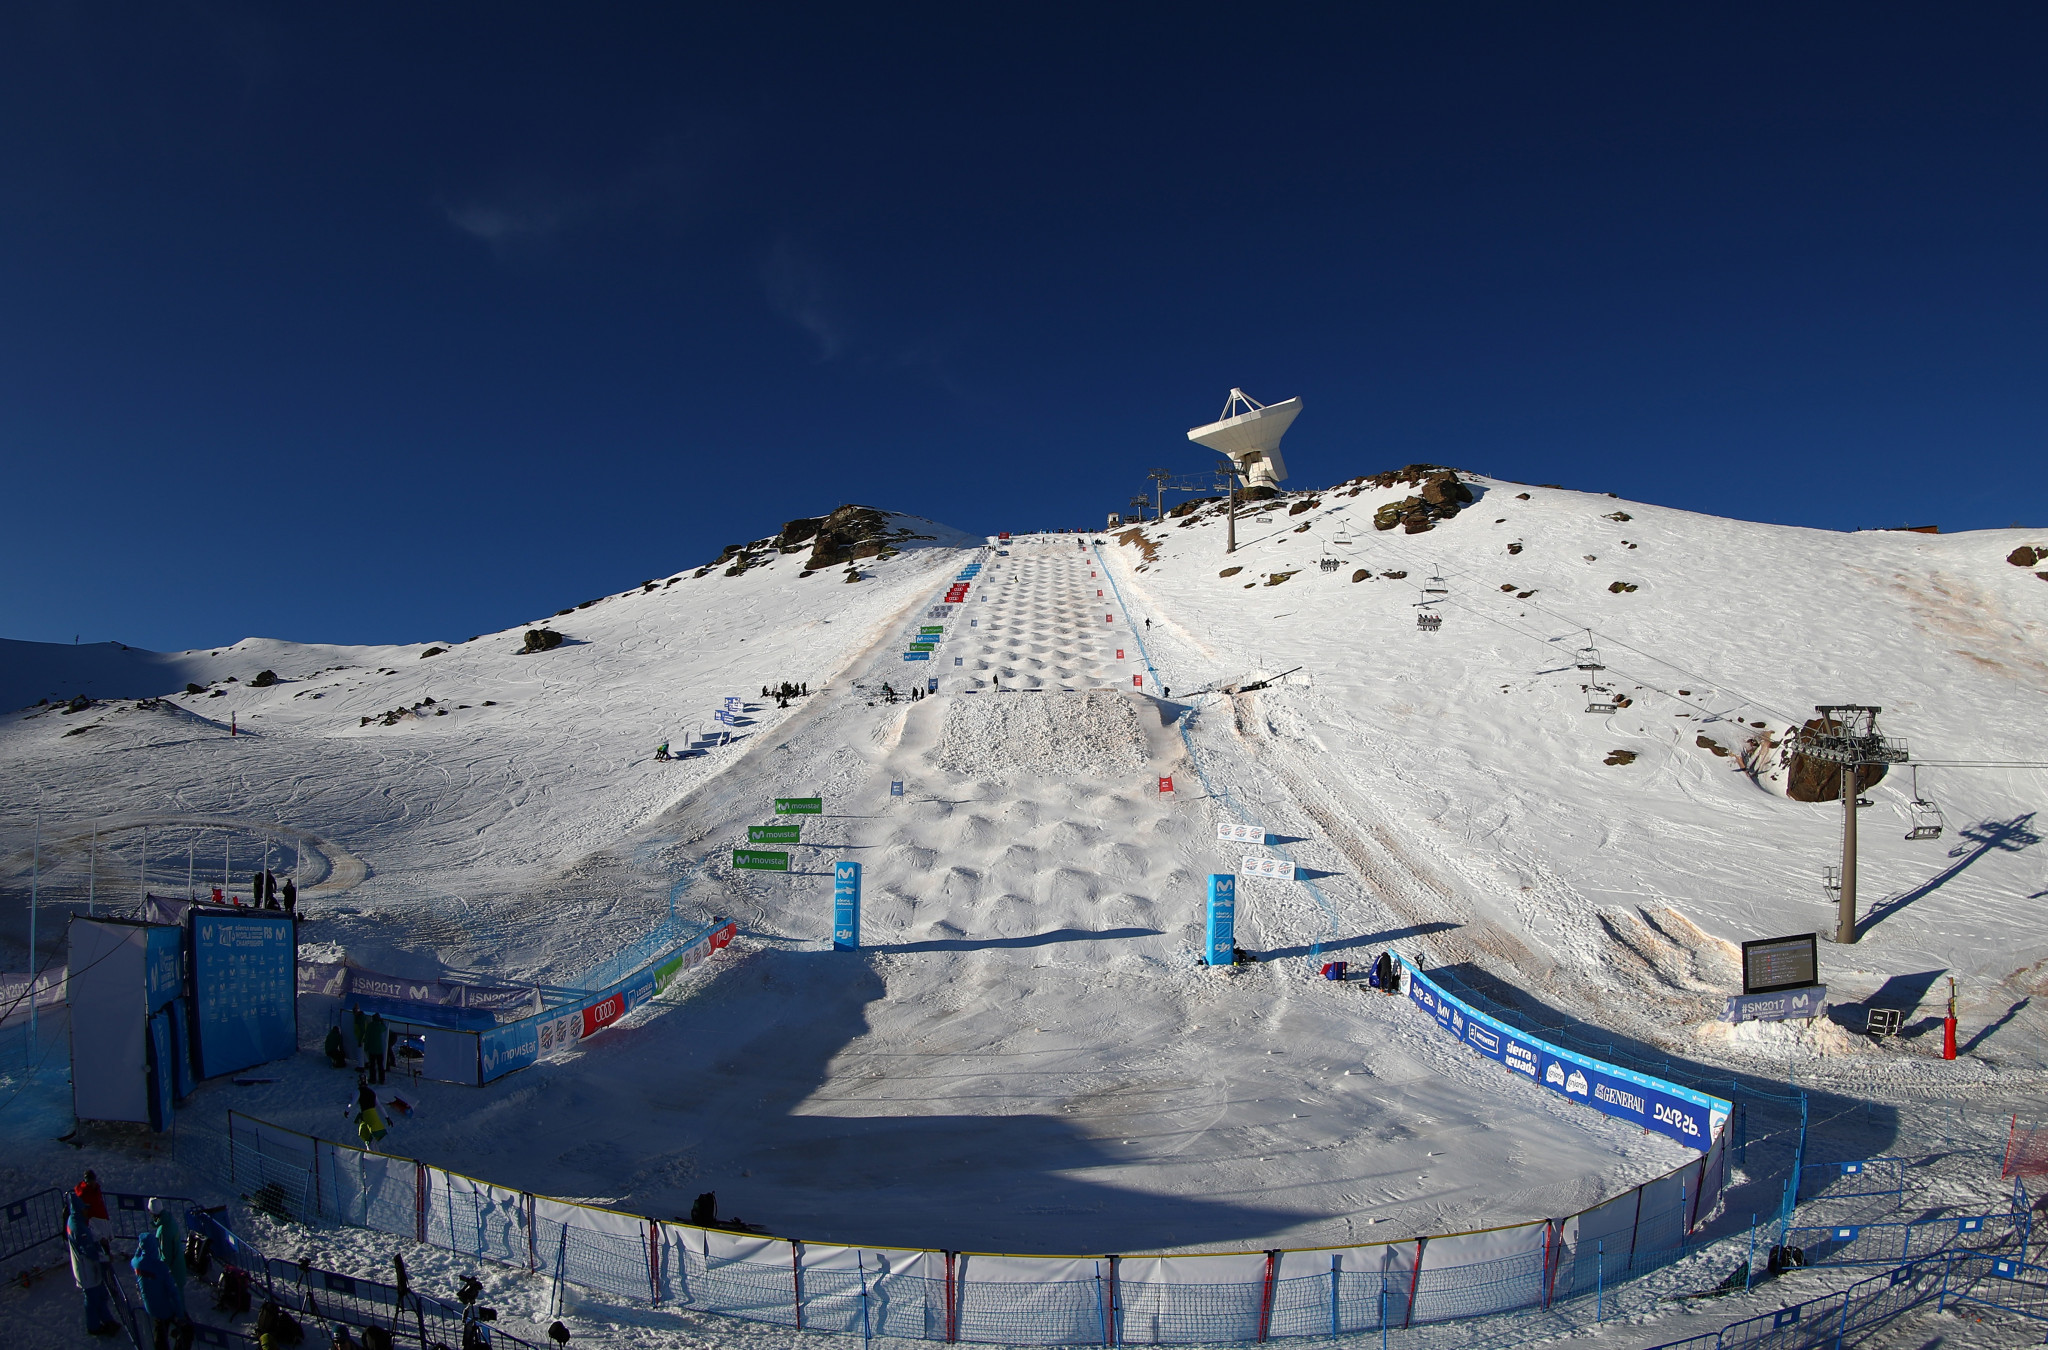 British Ski and Snowboard create new moguls programme